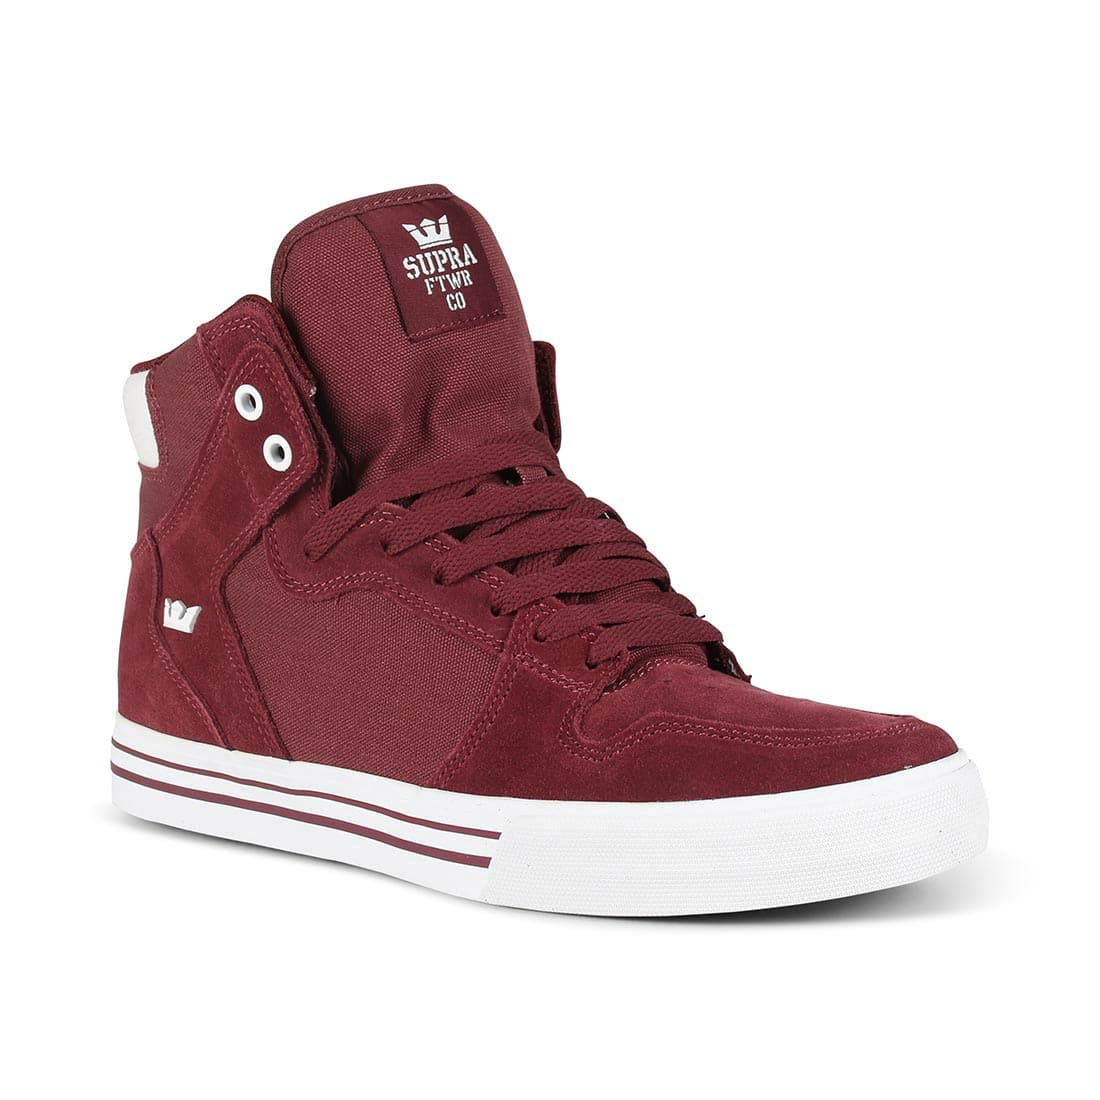 Supra Vaider High Top Shoes - Andorra / White